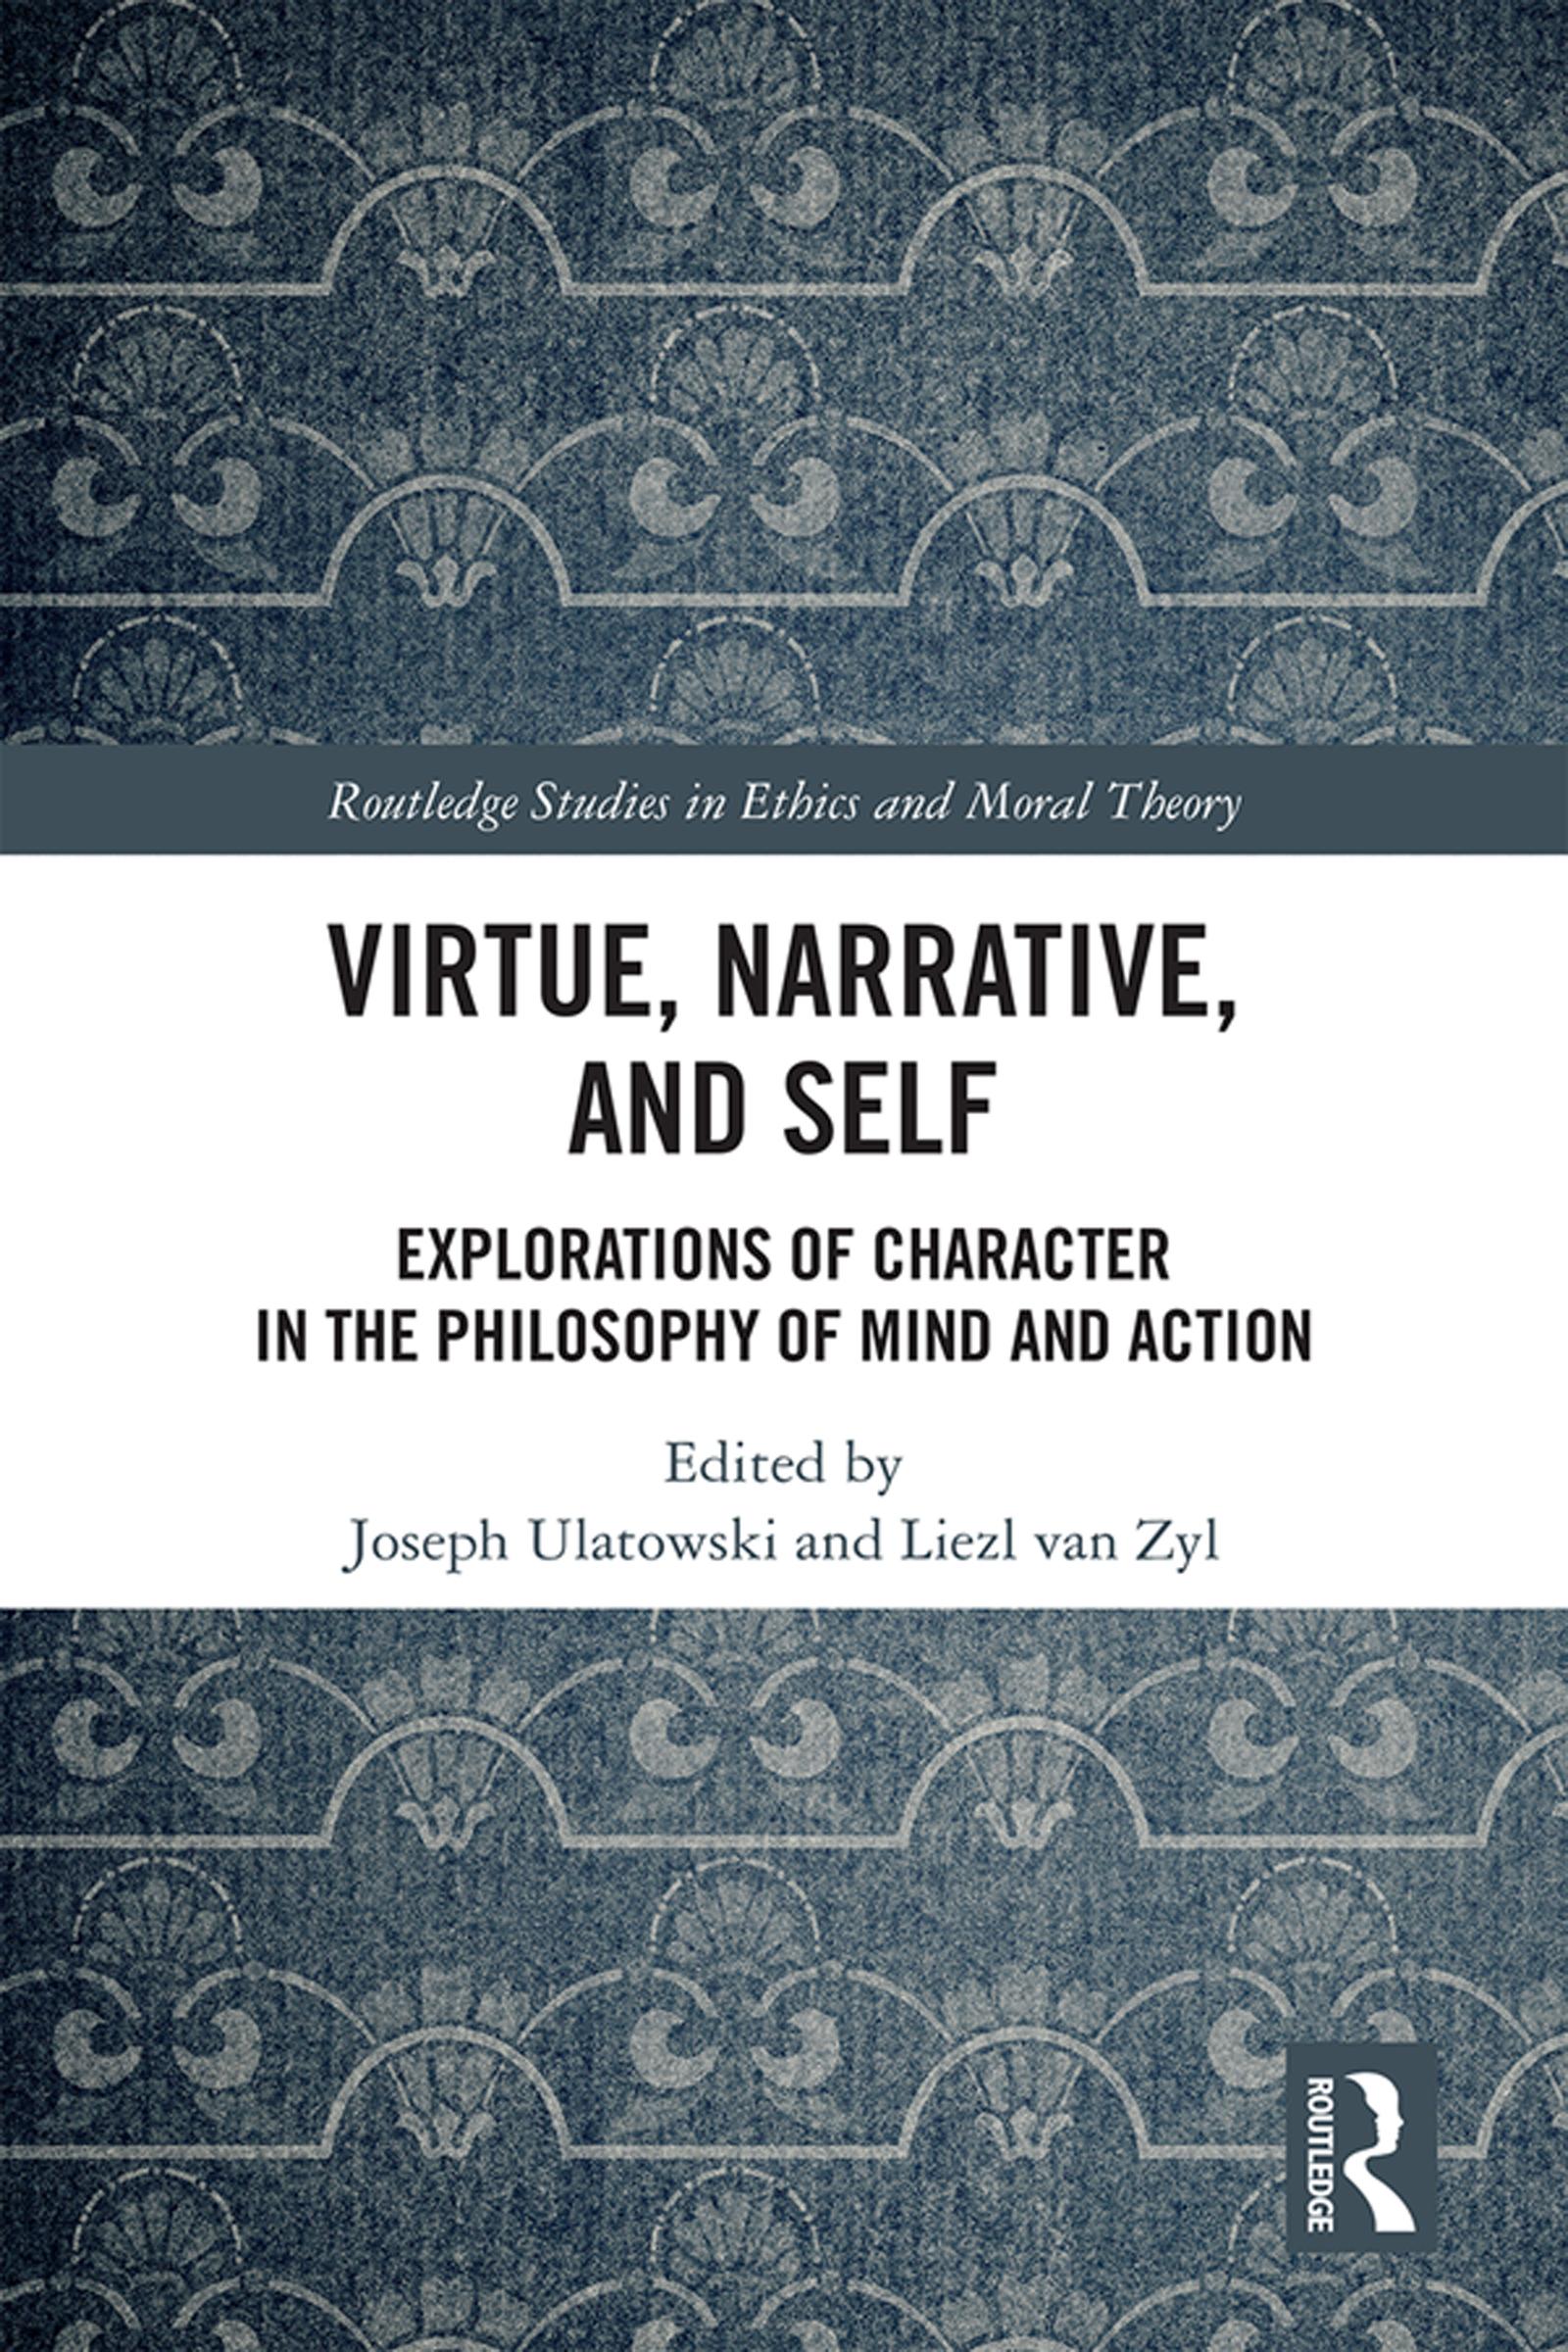 Virtue Ethics and Narrative Virtue